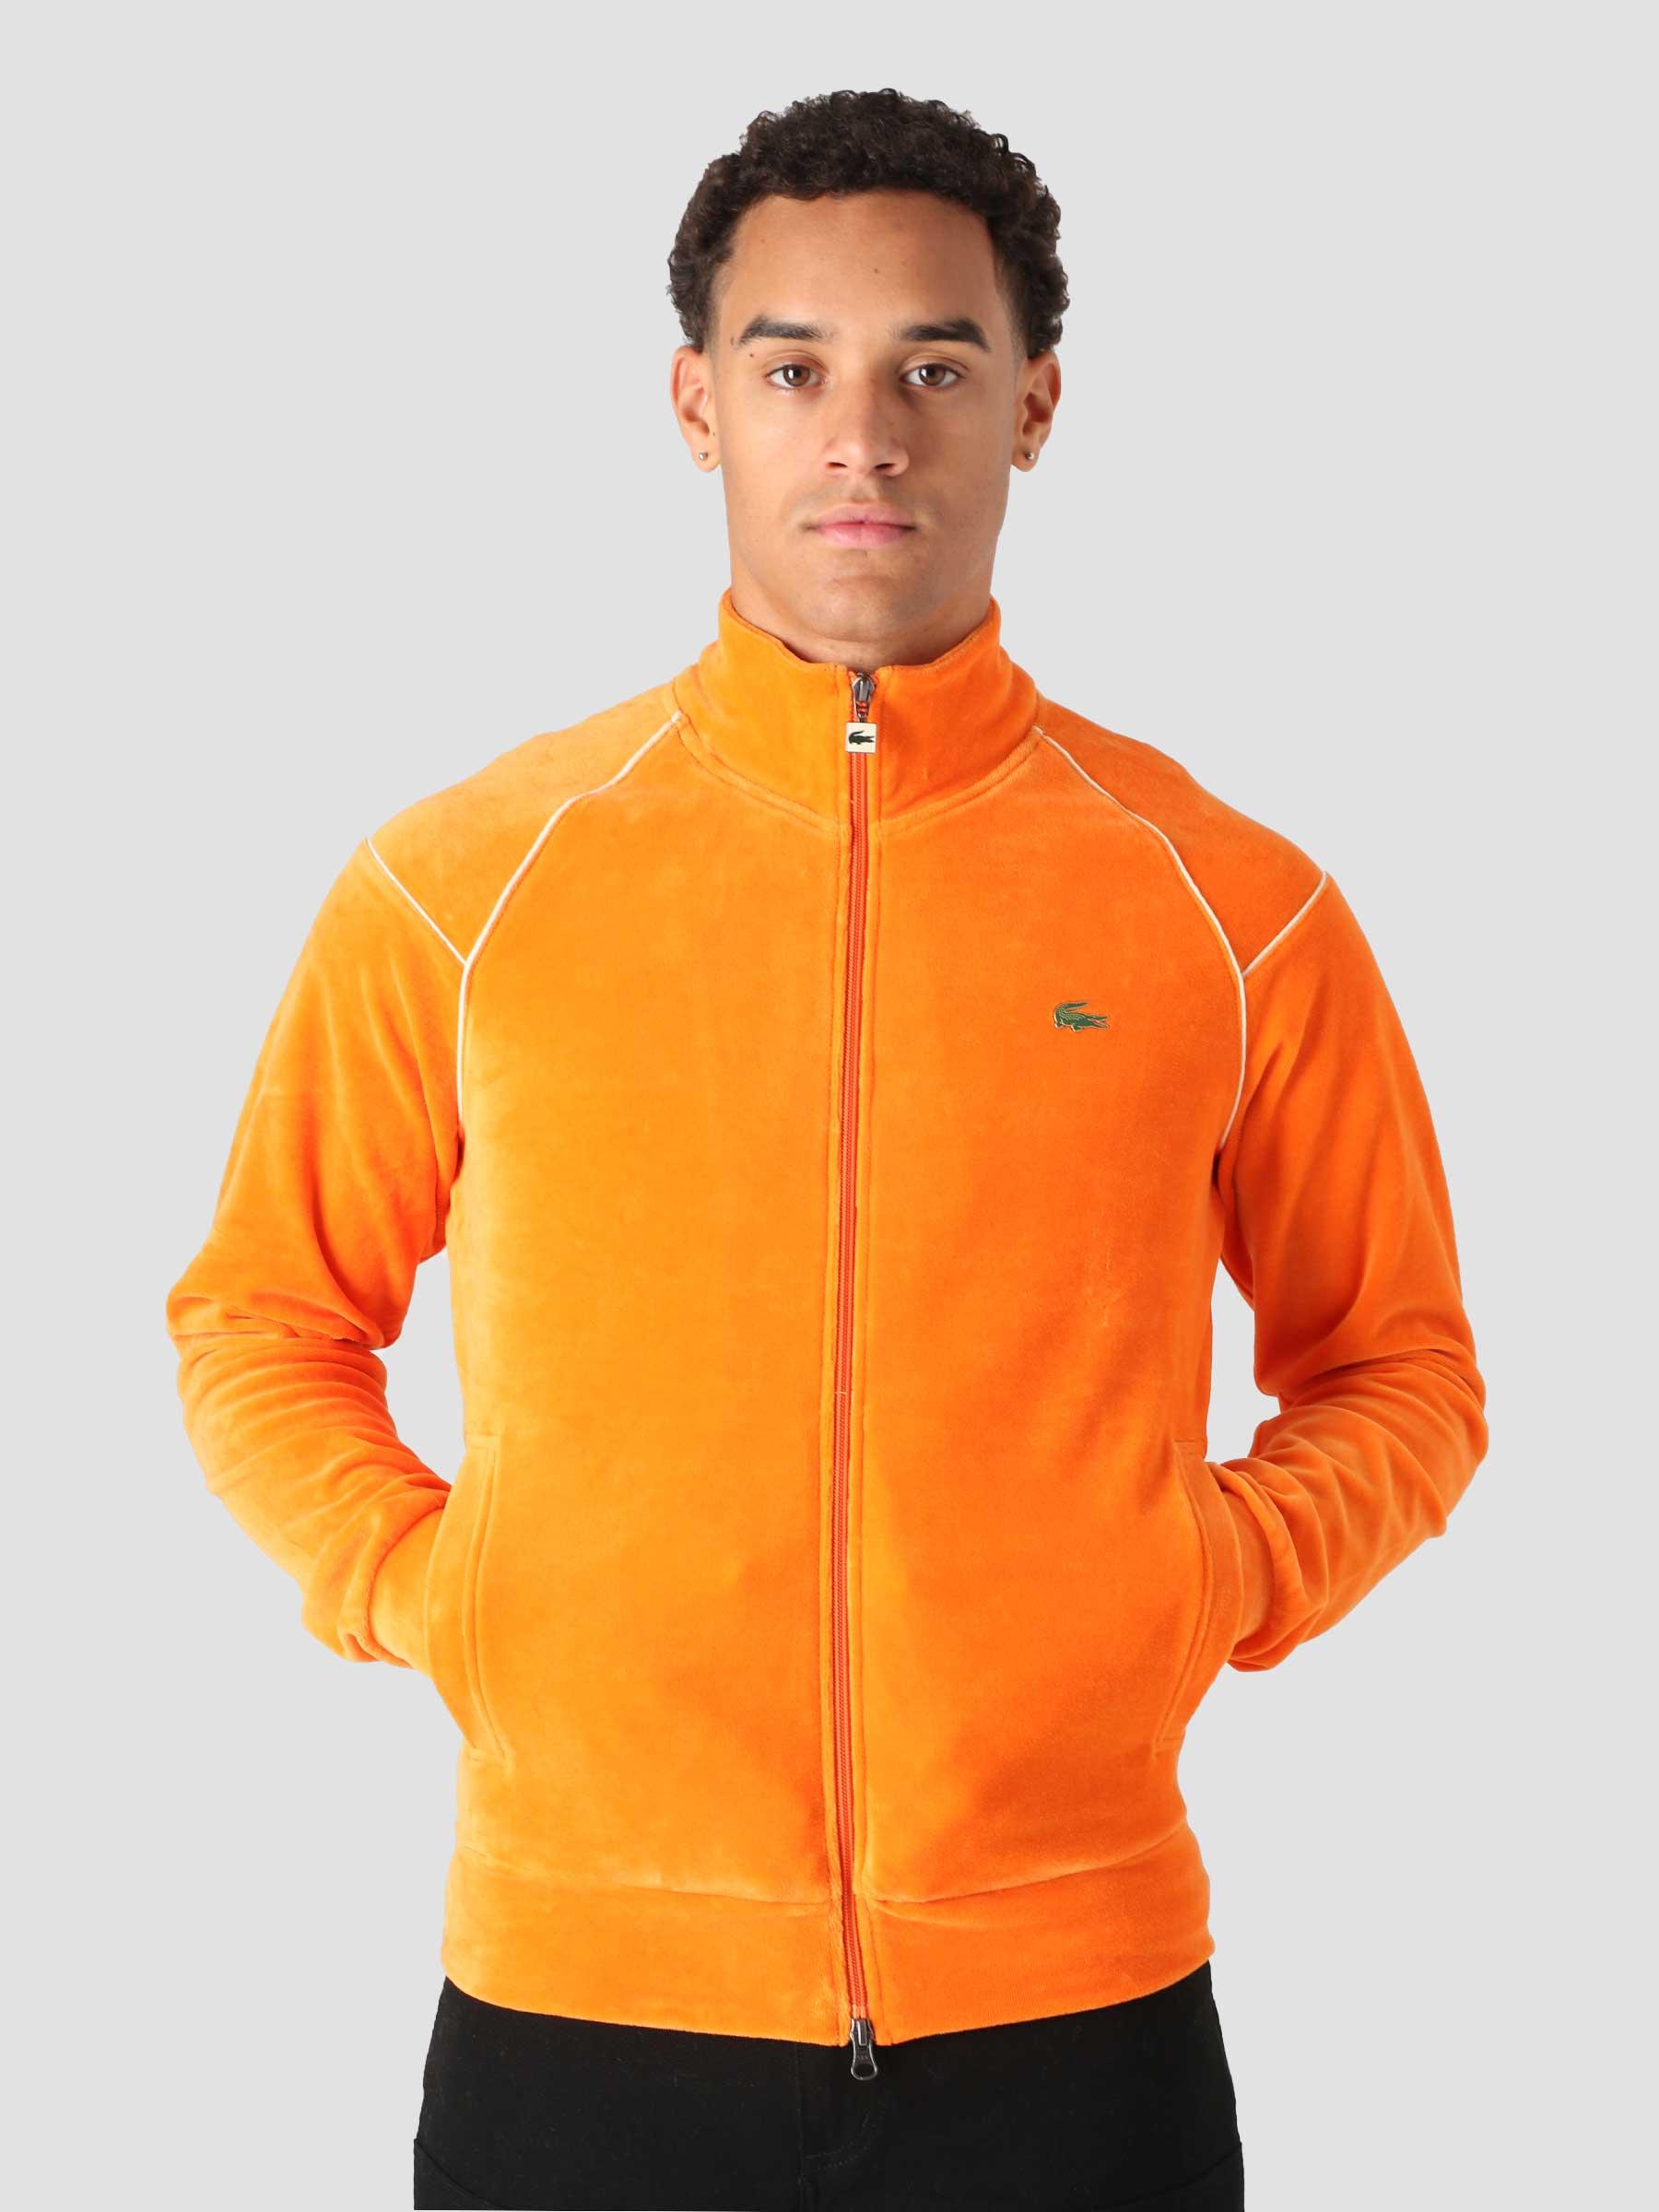 1HS1 Men's Sweatshirt 08 Fango SH7261-13